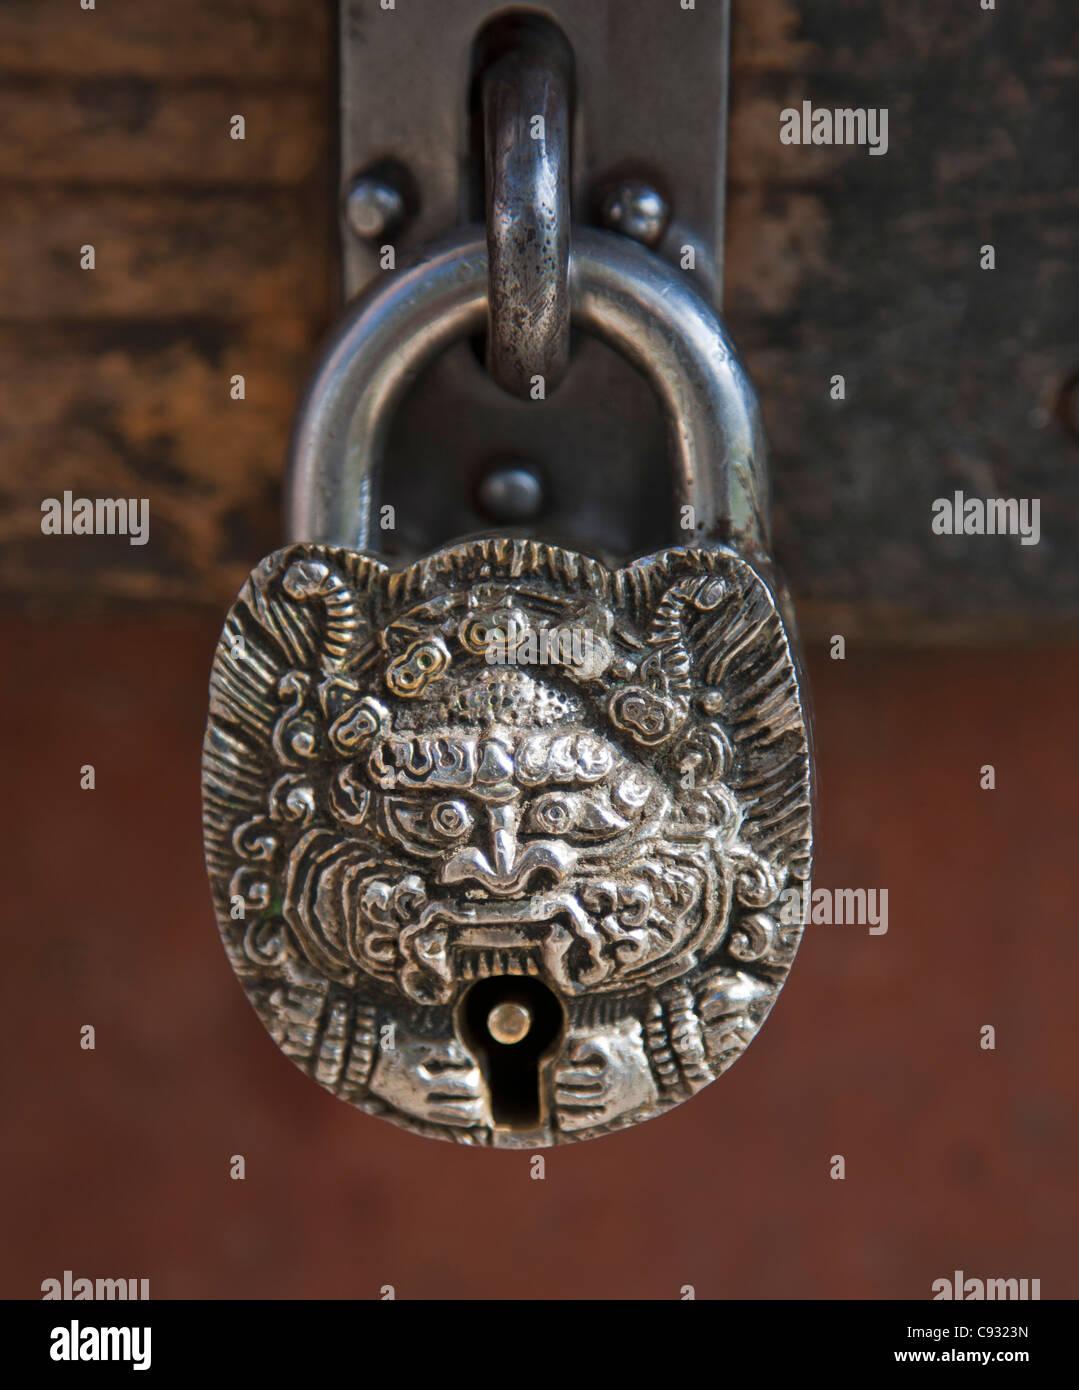 An ornate Bhutanese padlock. - Stock Image